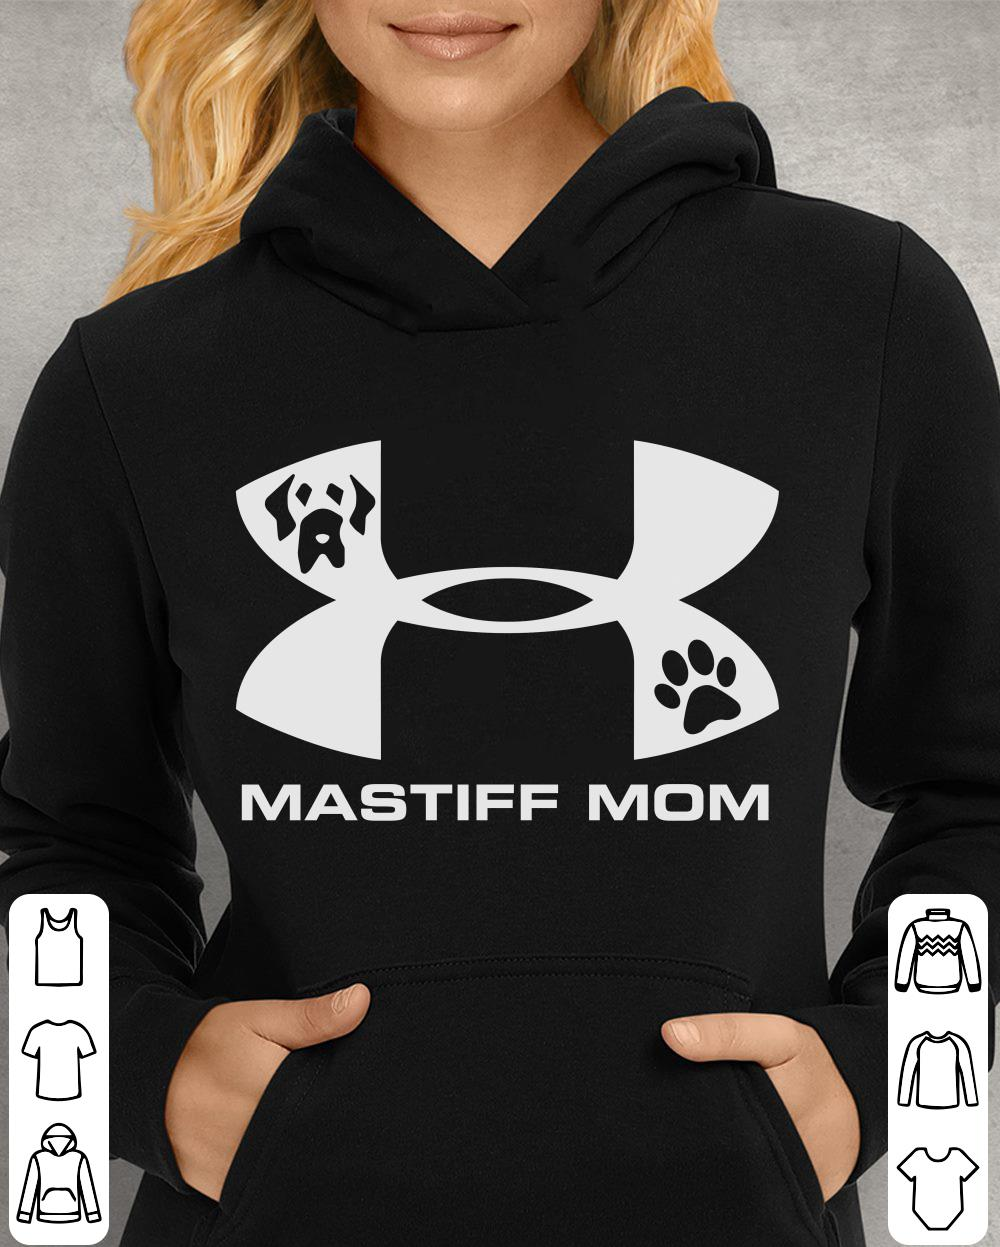 https://unicornshirts.net/images/2018/11/Under-Armour-Mastiff-Mom-shirt_4.jpg